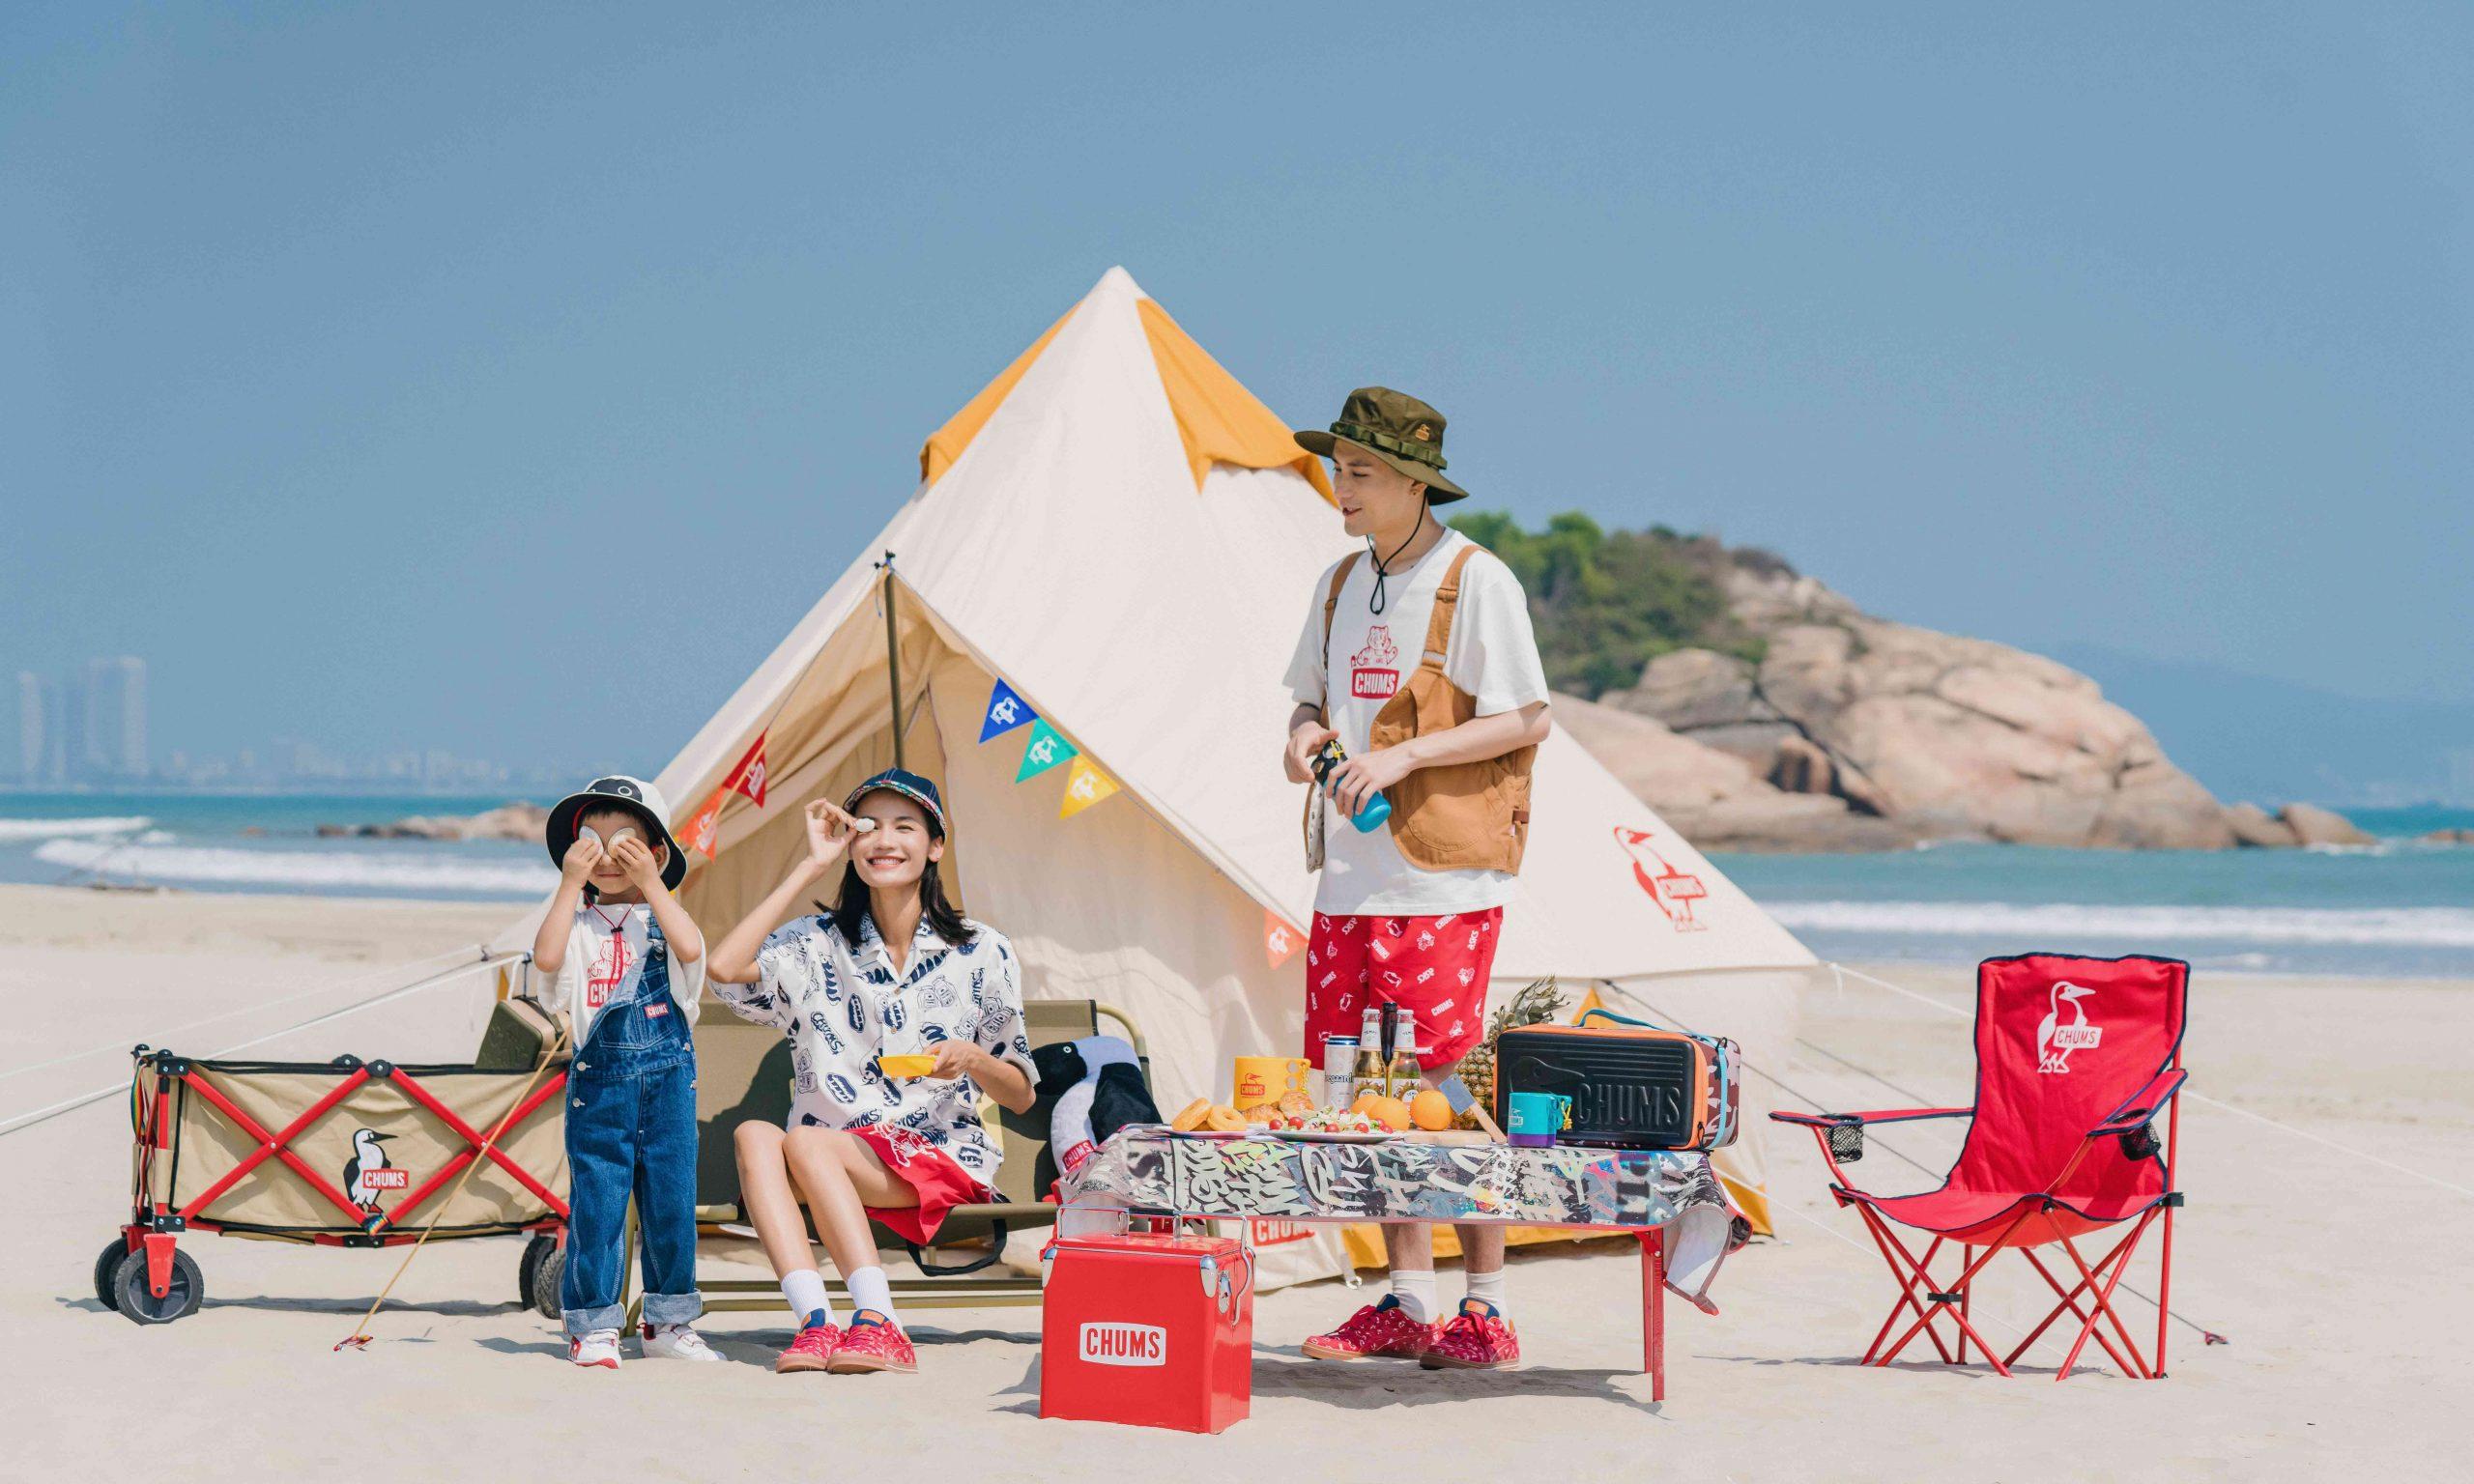 ASICS 联手 CHUMS 共同打造家庭式趣味户外新体验